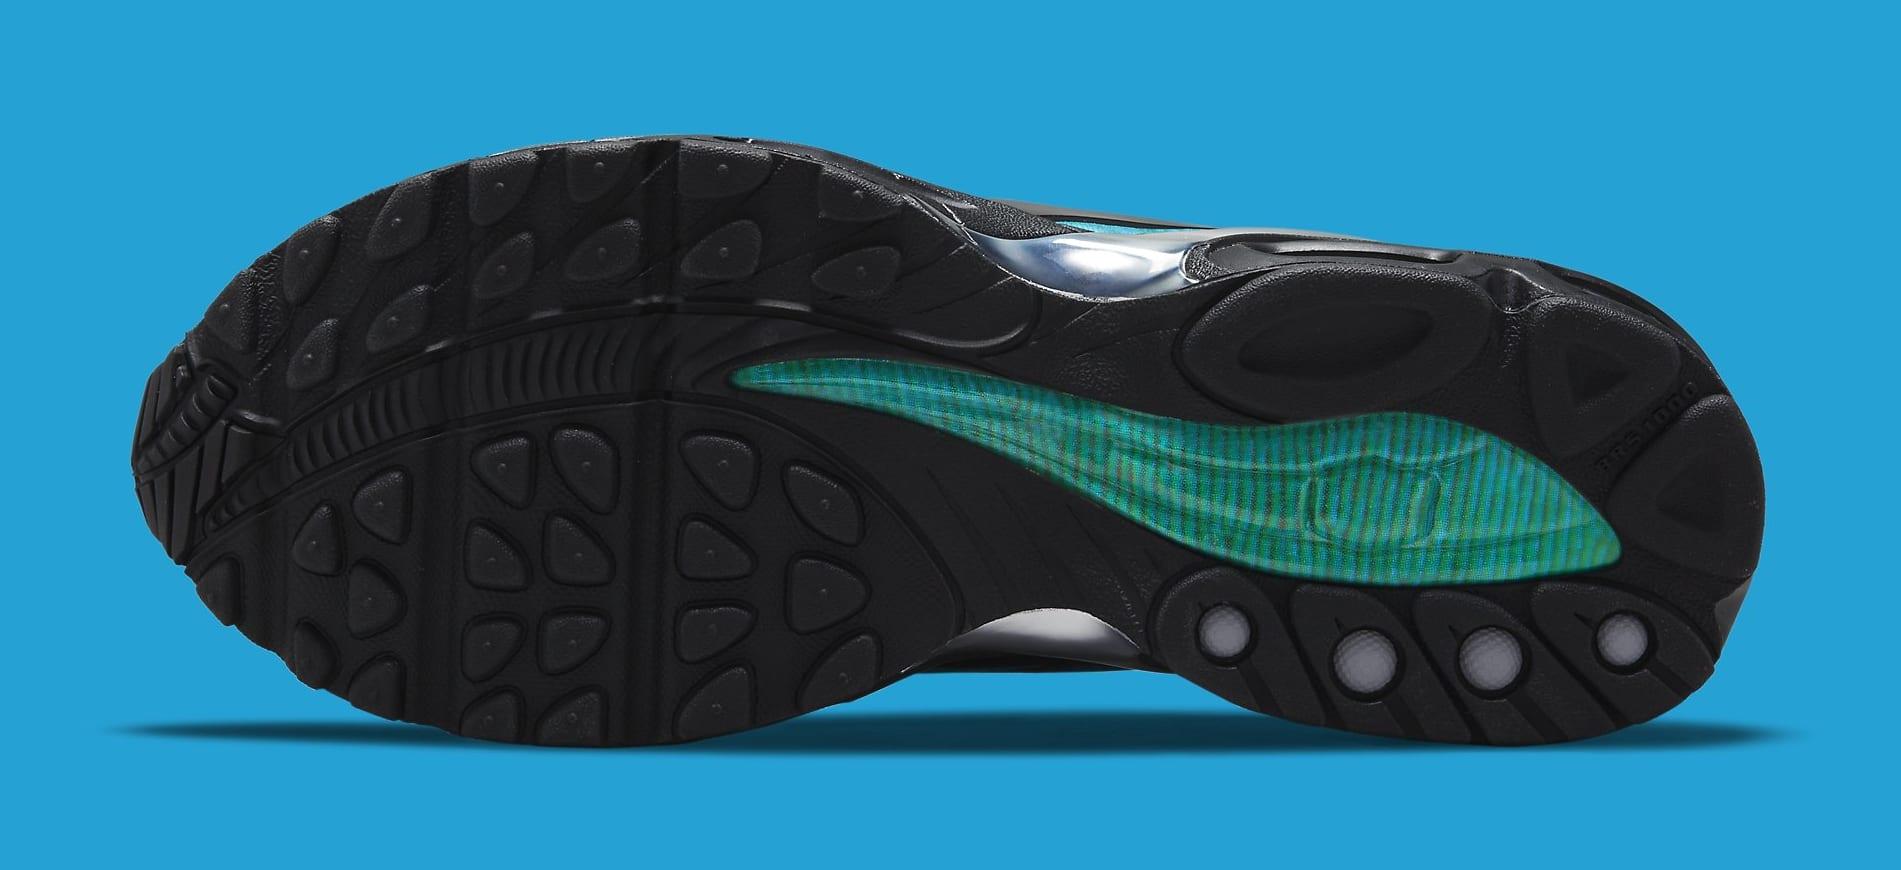 Skepta x Nike Air Tailwind V 'Blue' CQ8714-001 Outsole